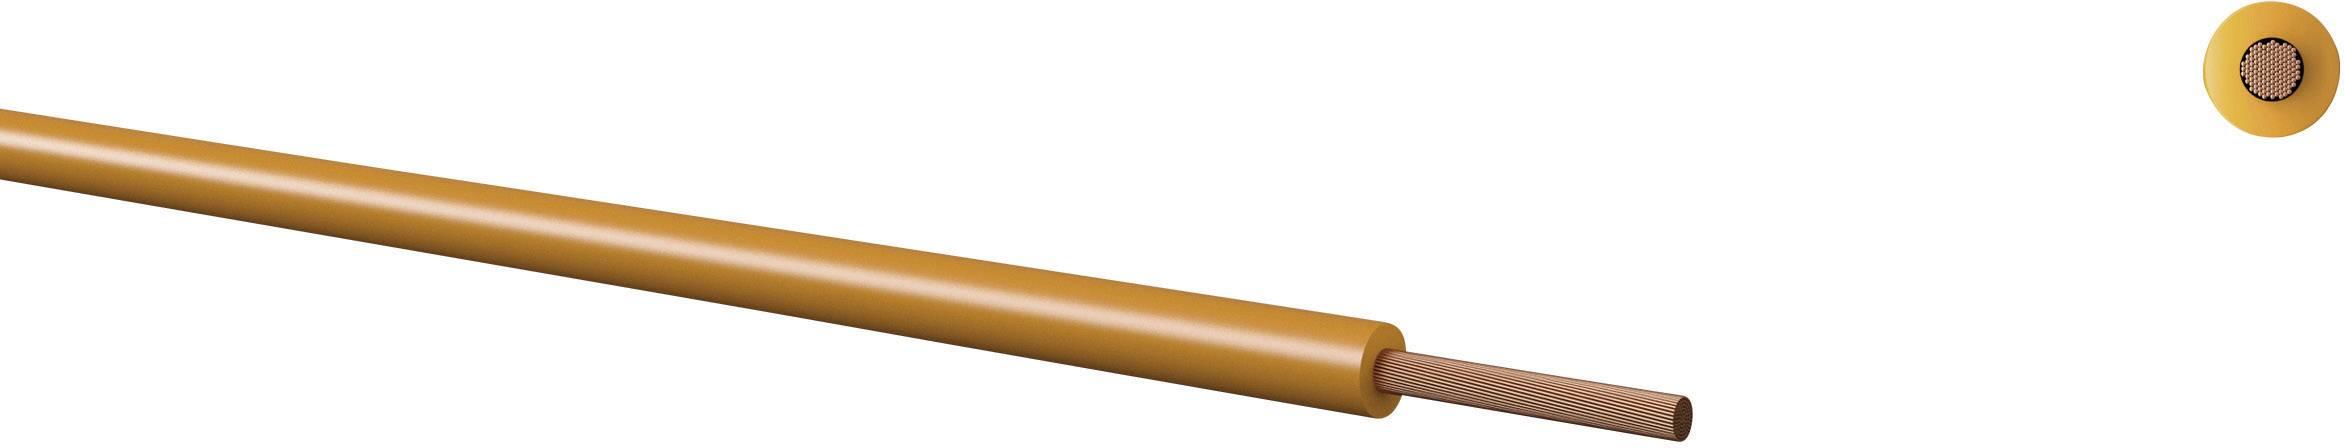 Pletenica LiFY 1 x 0.25 mm, rdeča Kabeltronik 160102508 cena za meter